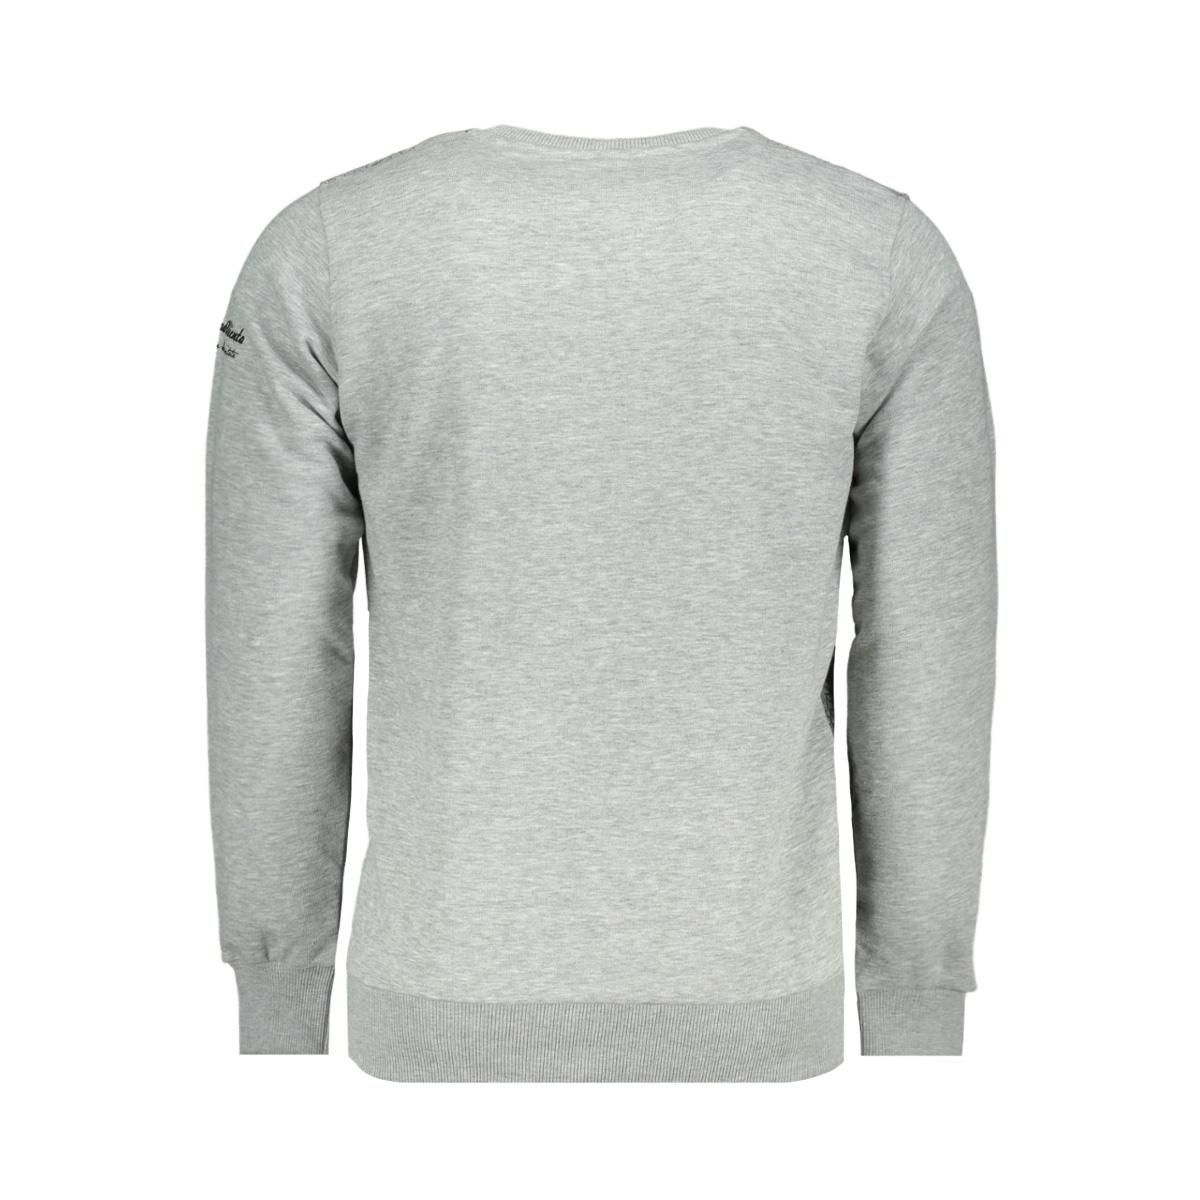 76118 gabbiano sweater grey